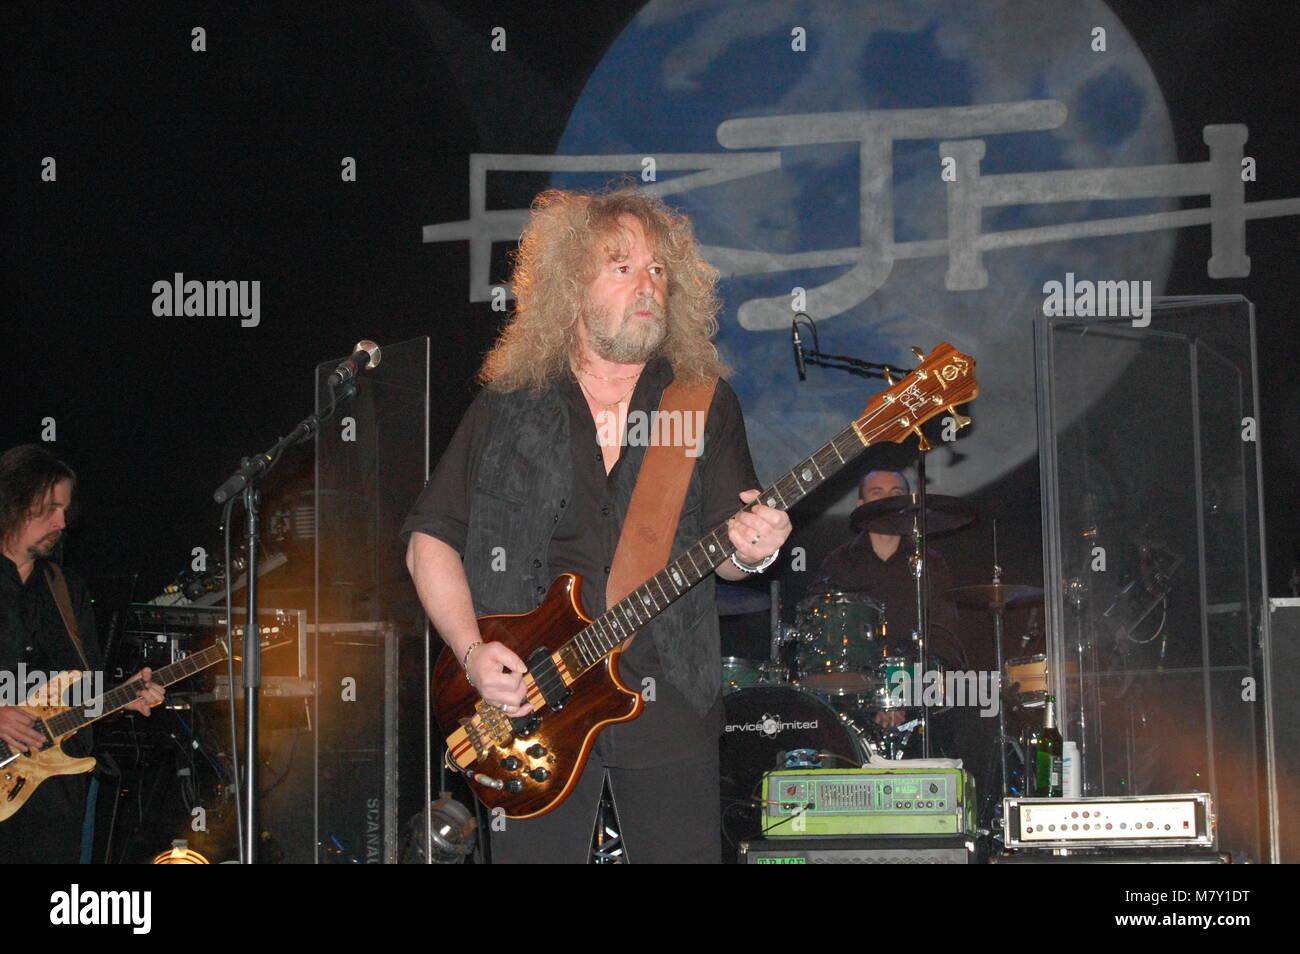 Live Musik Stock Photos & Live Musik Stock Images - Alamy